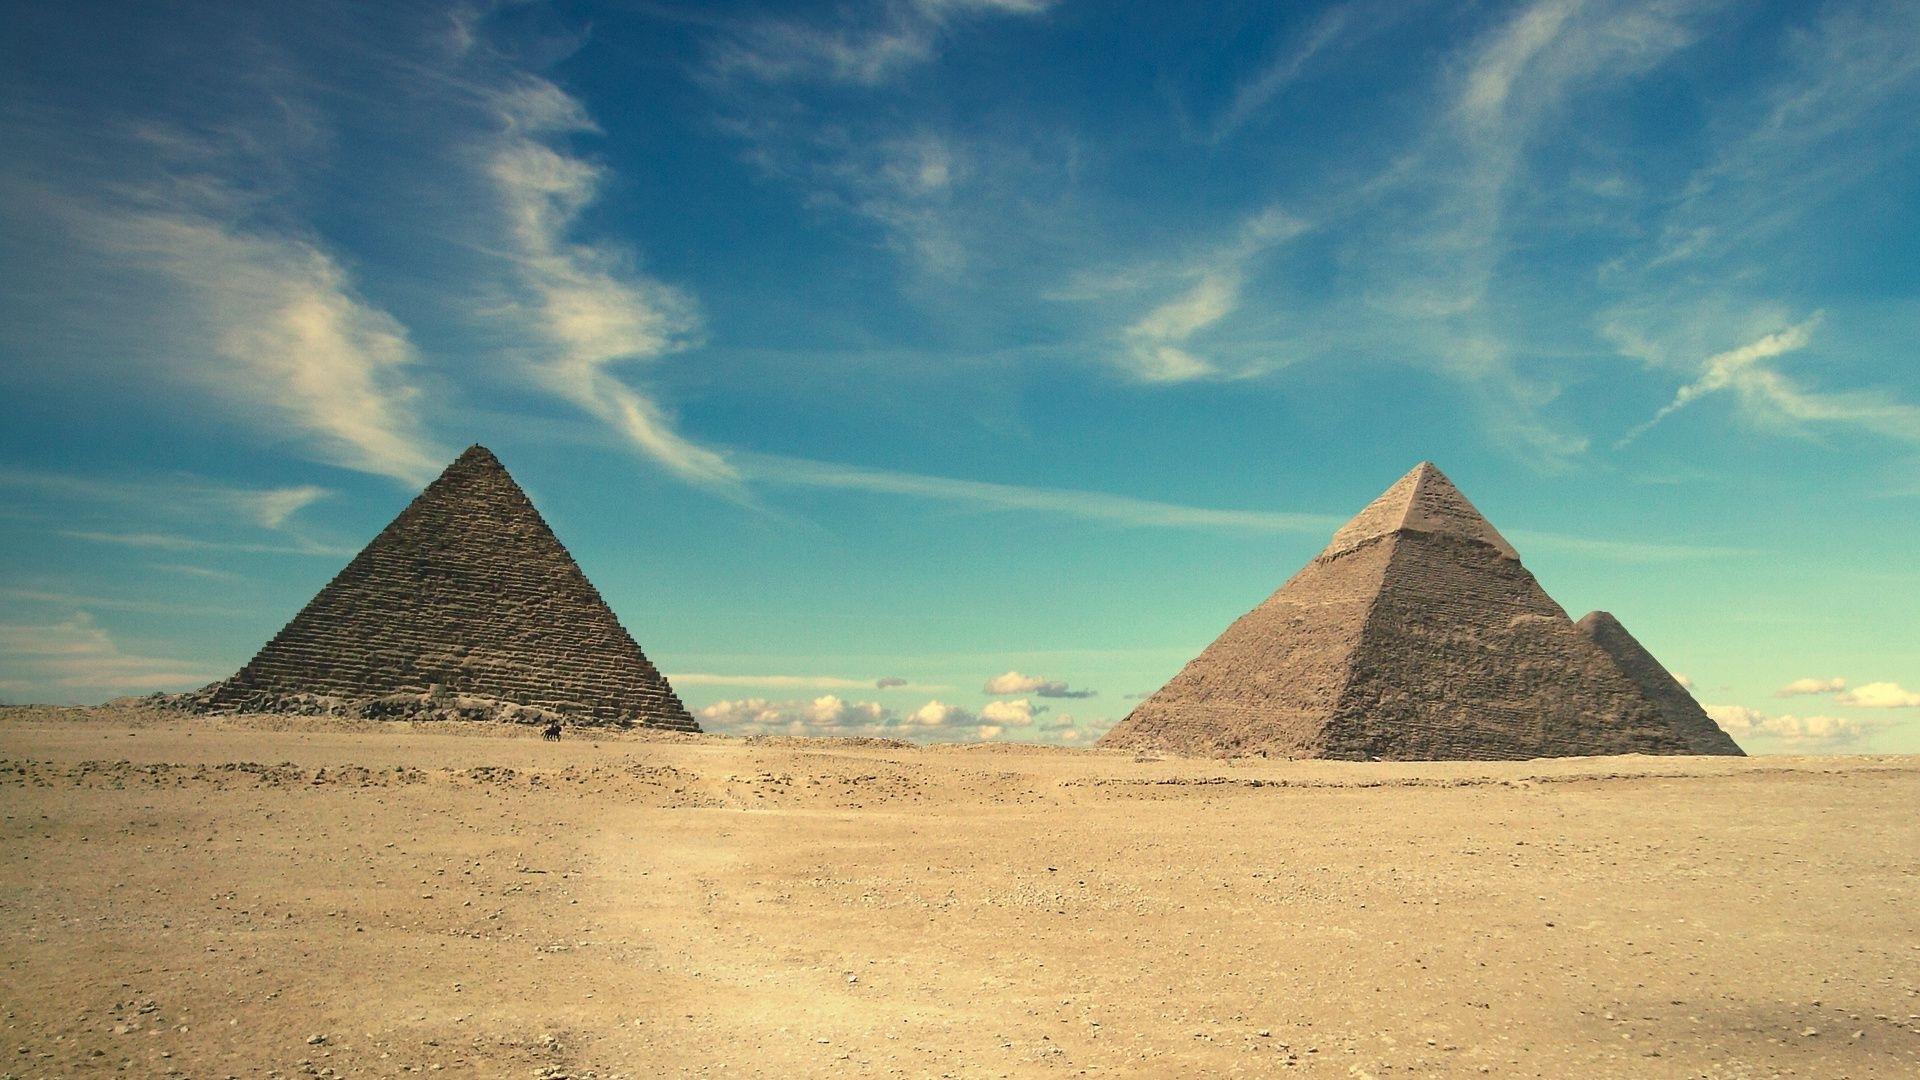 Egypt HD Wallpaper